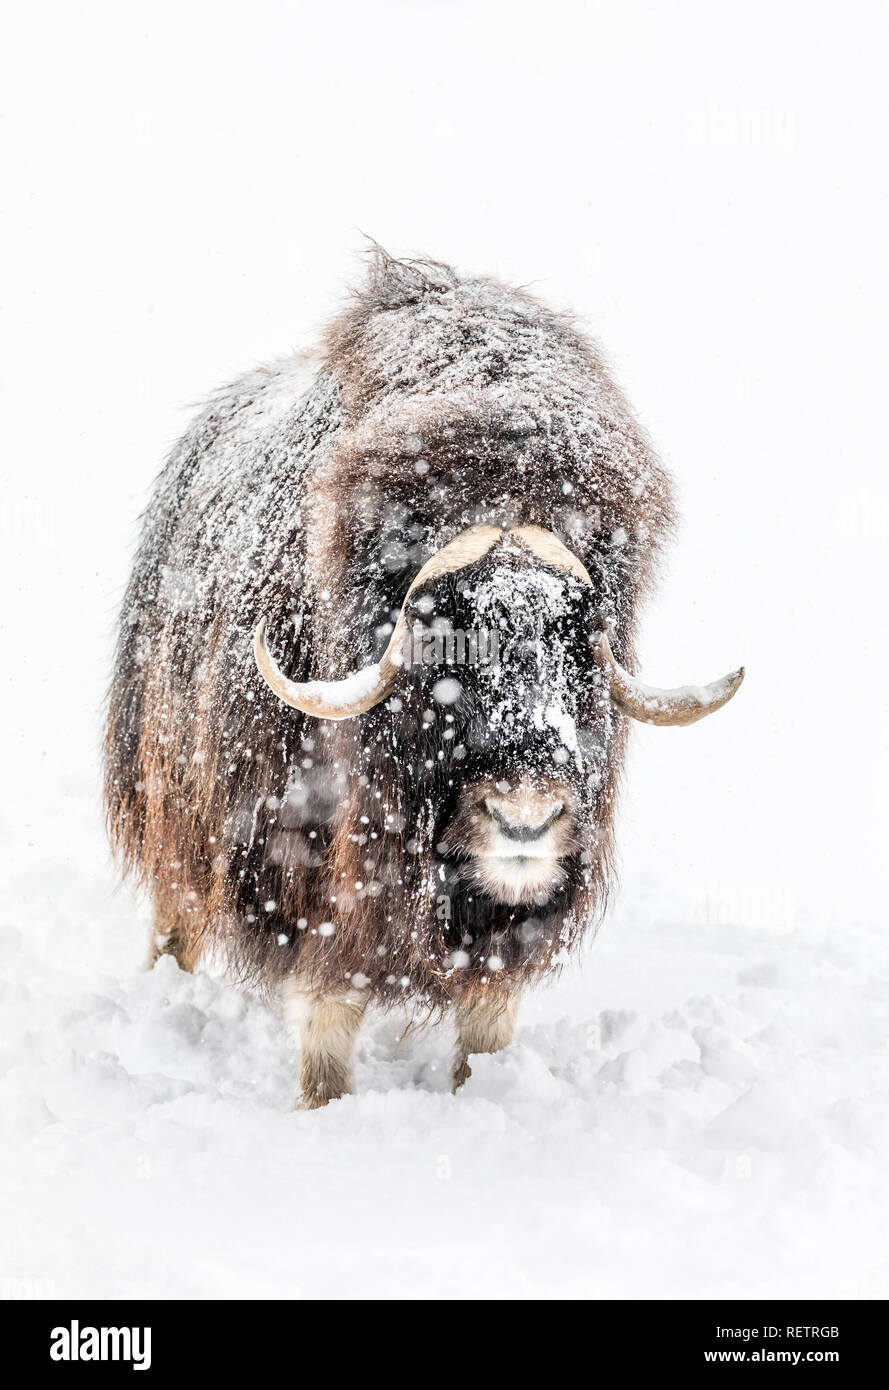 Muskox, Ovibos moschatus, in a winter snowstorm, captive animal, Manitoba, Canada. - Stock Image